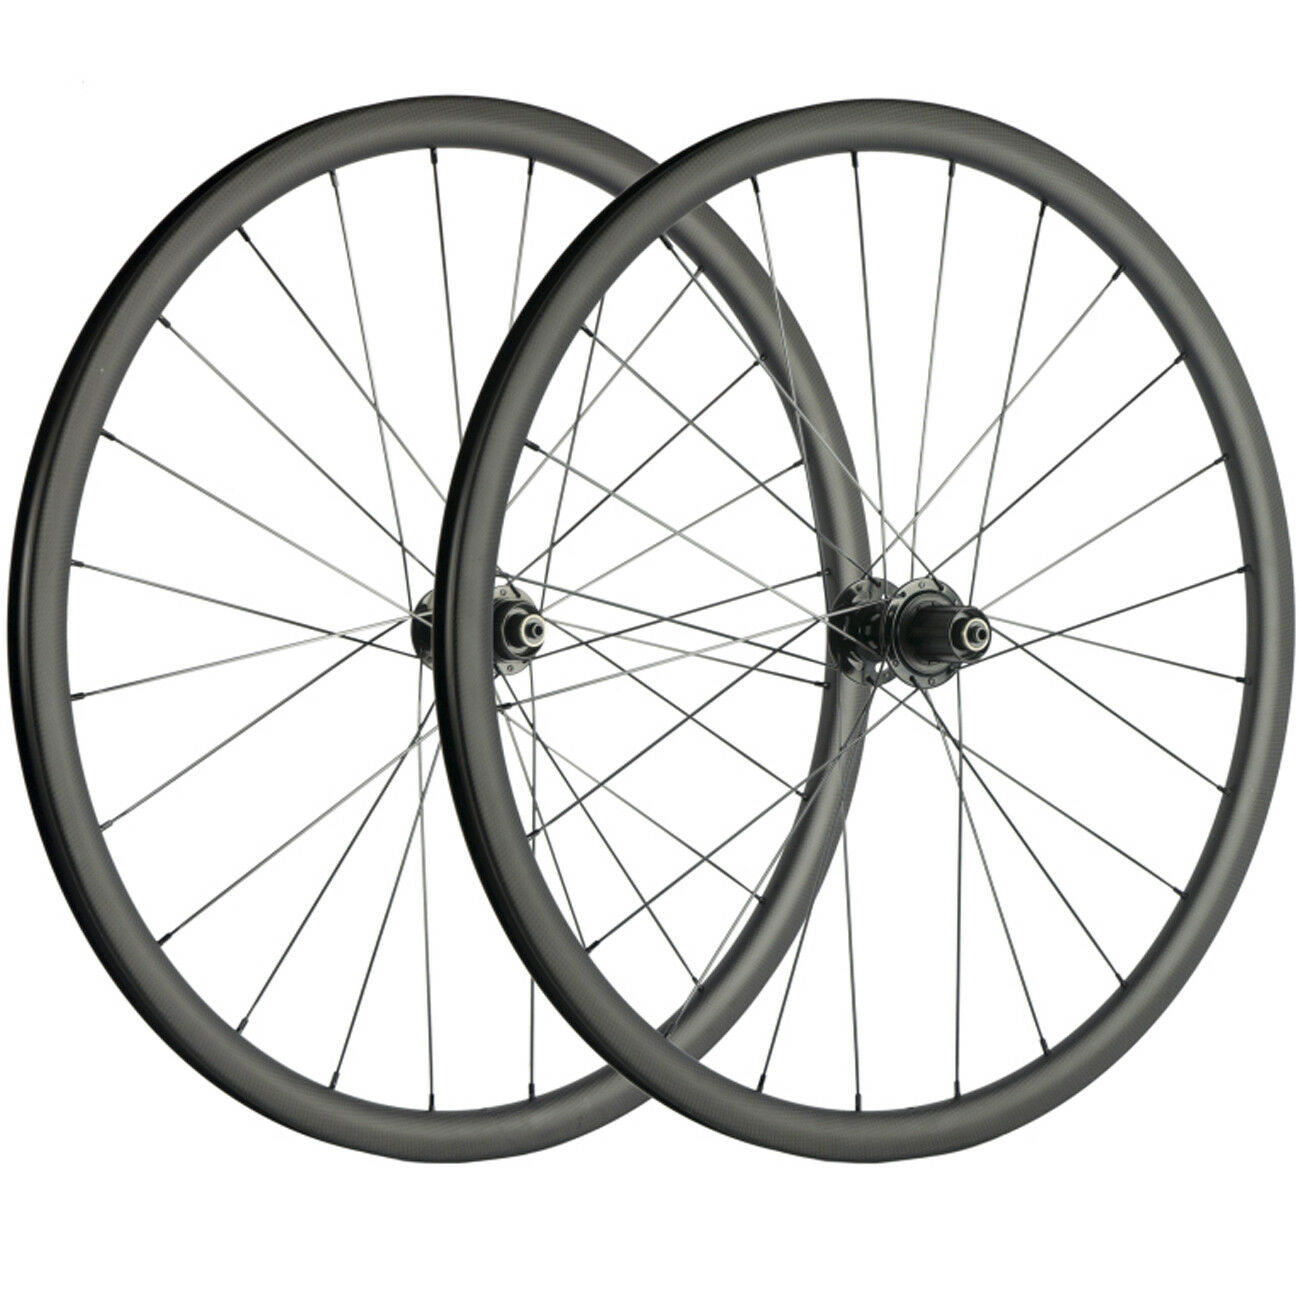 700C Carbon Wheelset 30mm Disc Brake Road Bike  Wheels Axle Thru QR CX3 hub  high quality